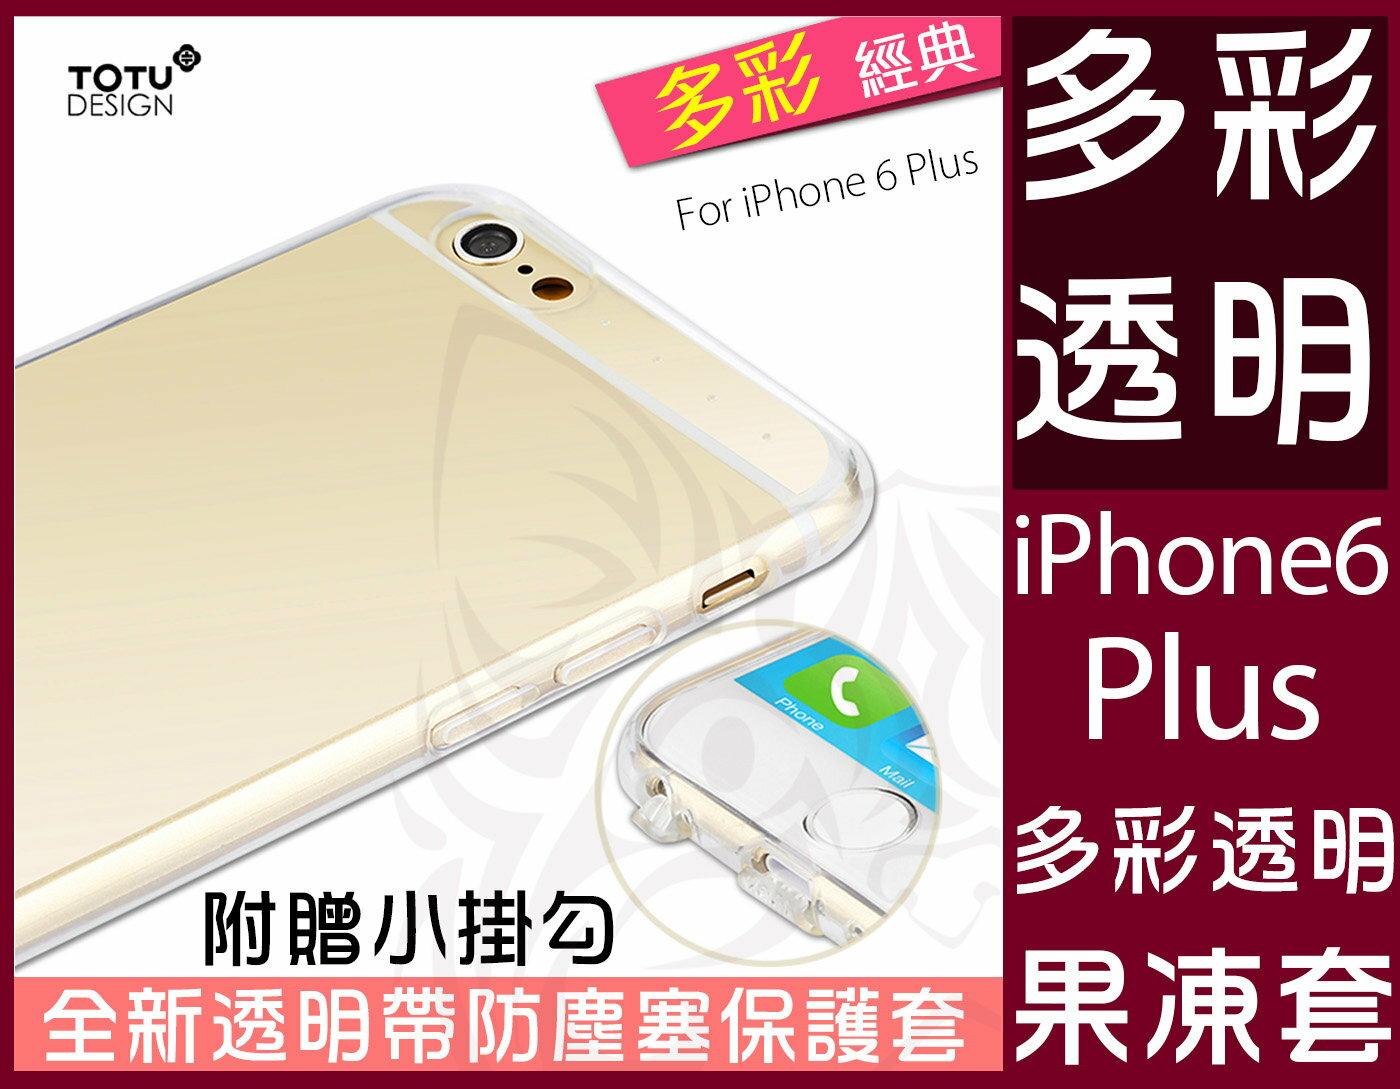 TOTU iPhone 6 plus 透明保護殼 【C-I6-P14】 帶防塵塞 多彩隱形套 手機殼 5.5吋 Alice3C - 限時優惠好康折扣